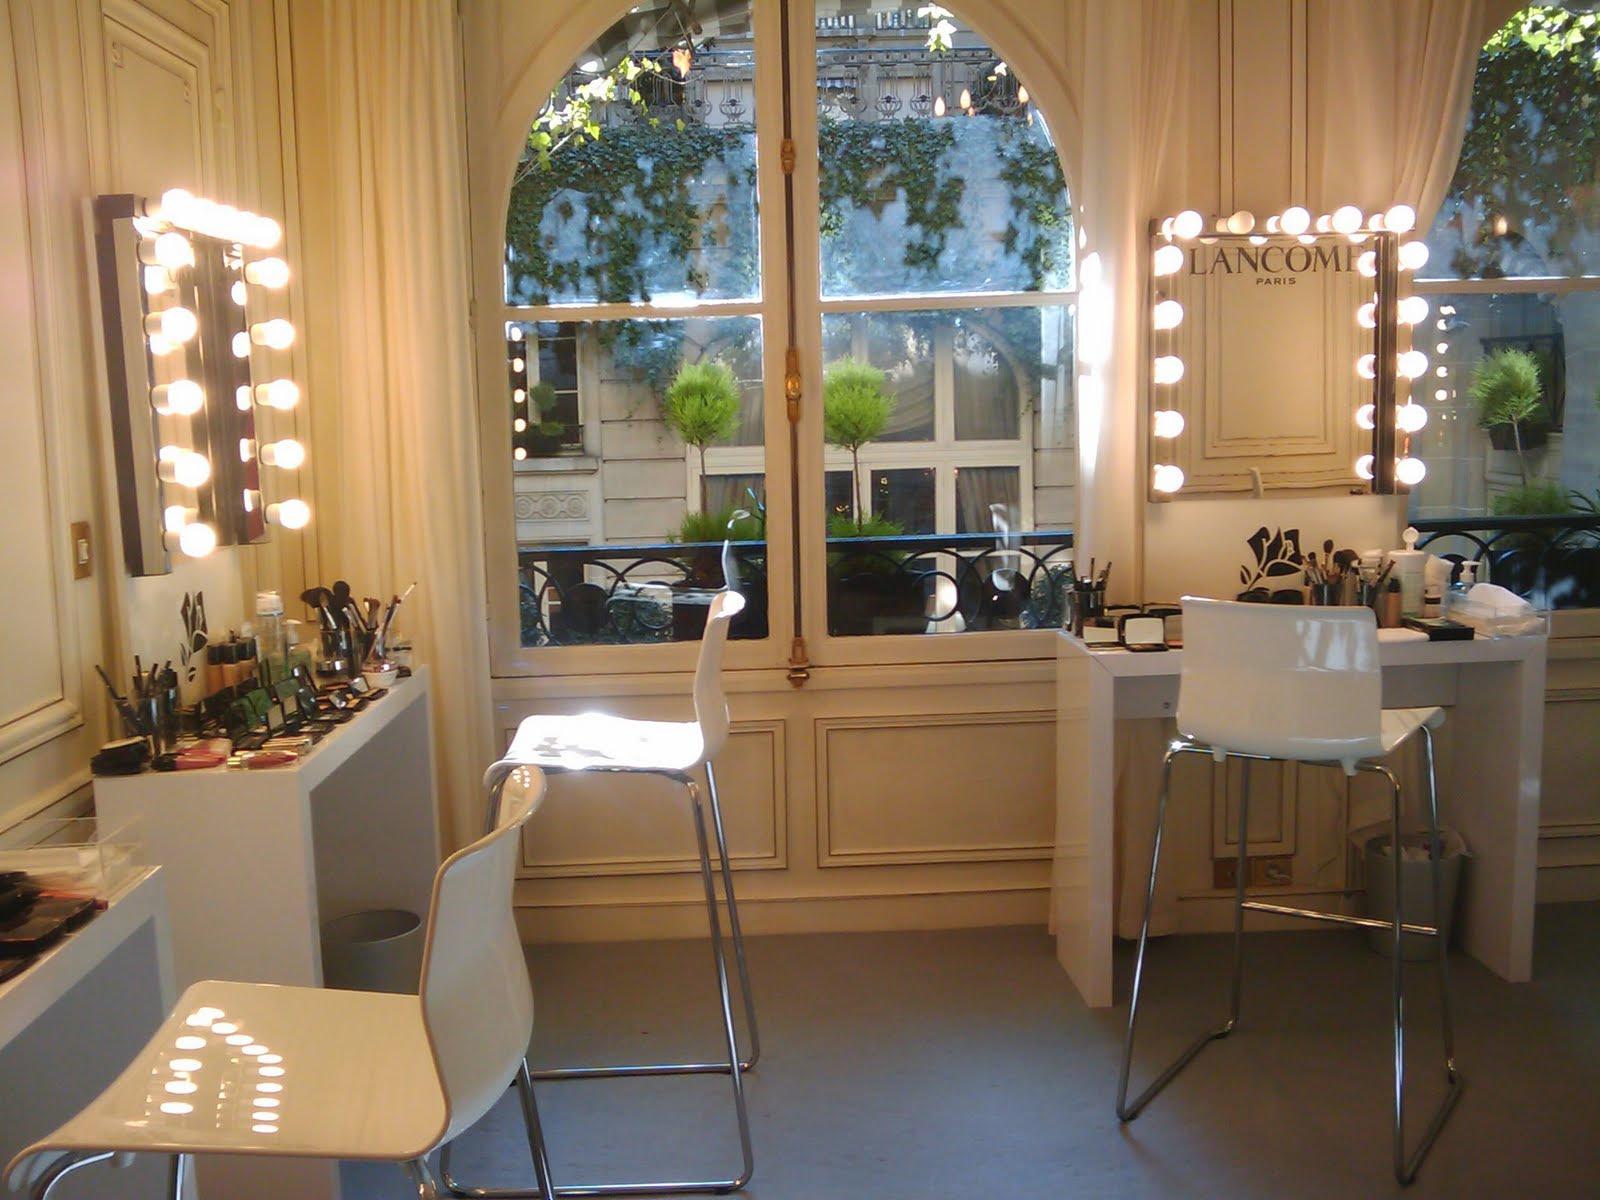 Makeup artist room